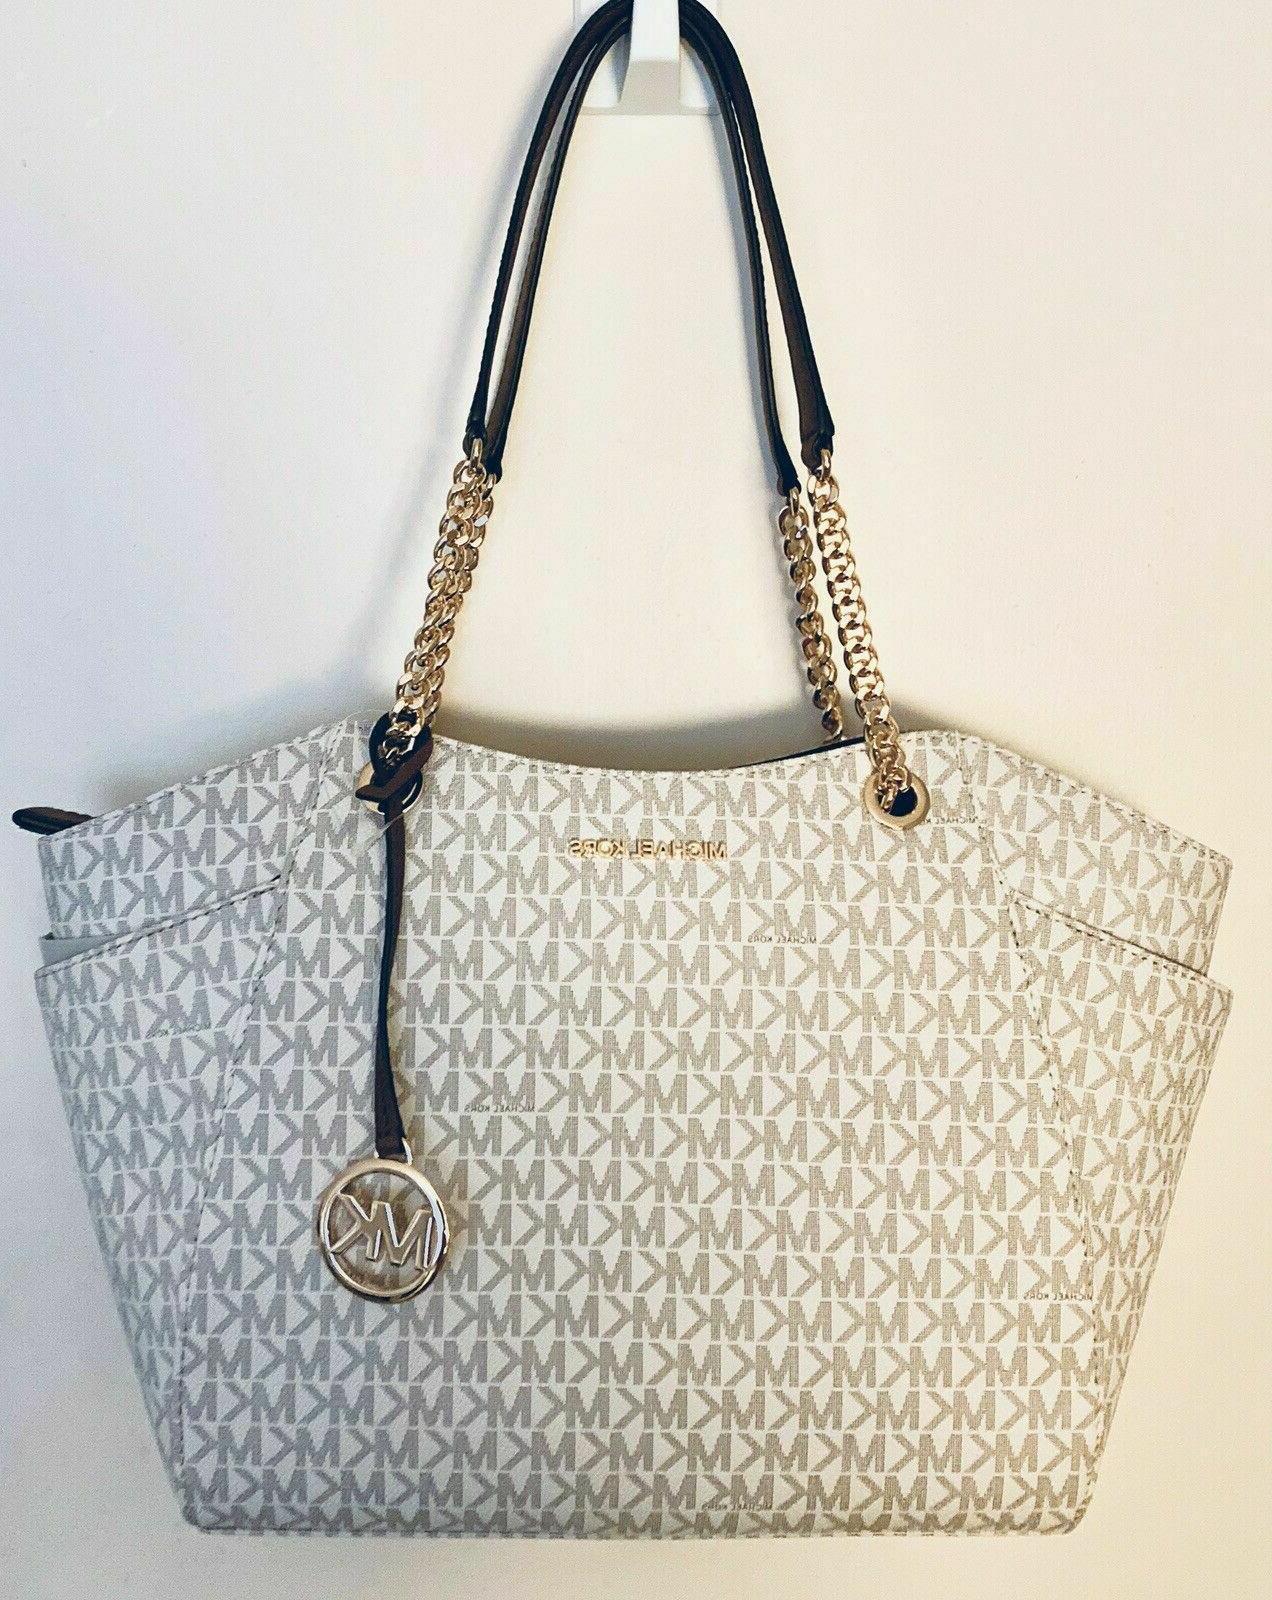 Michael Chain MK Large Bag